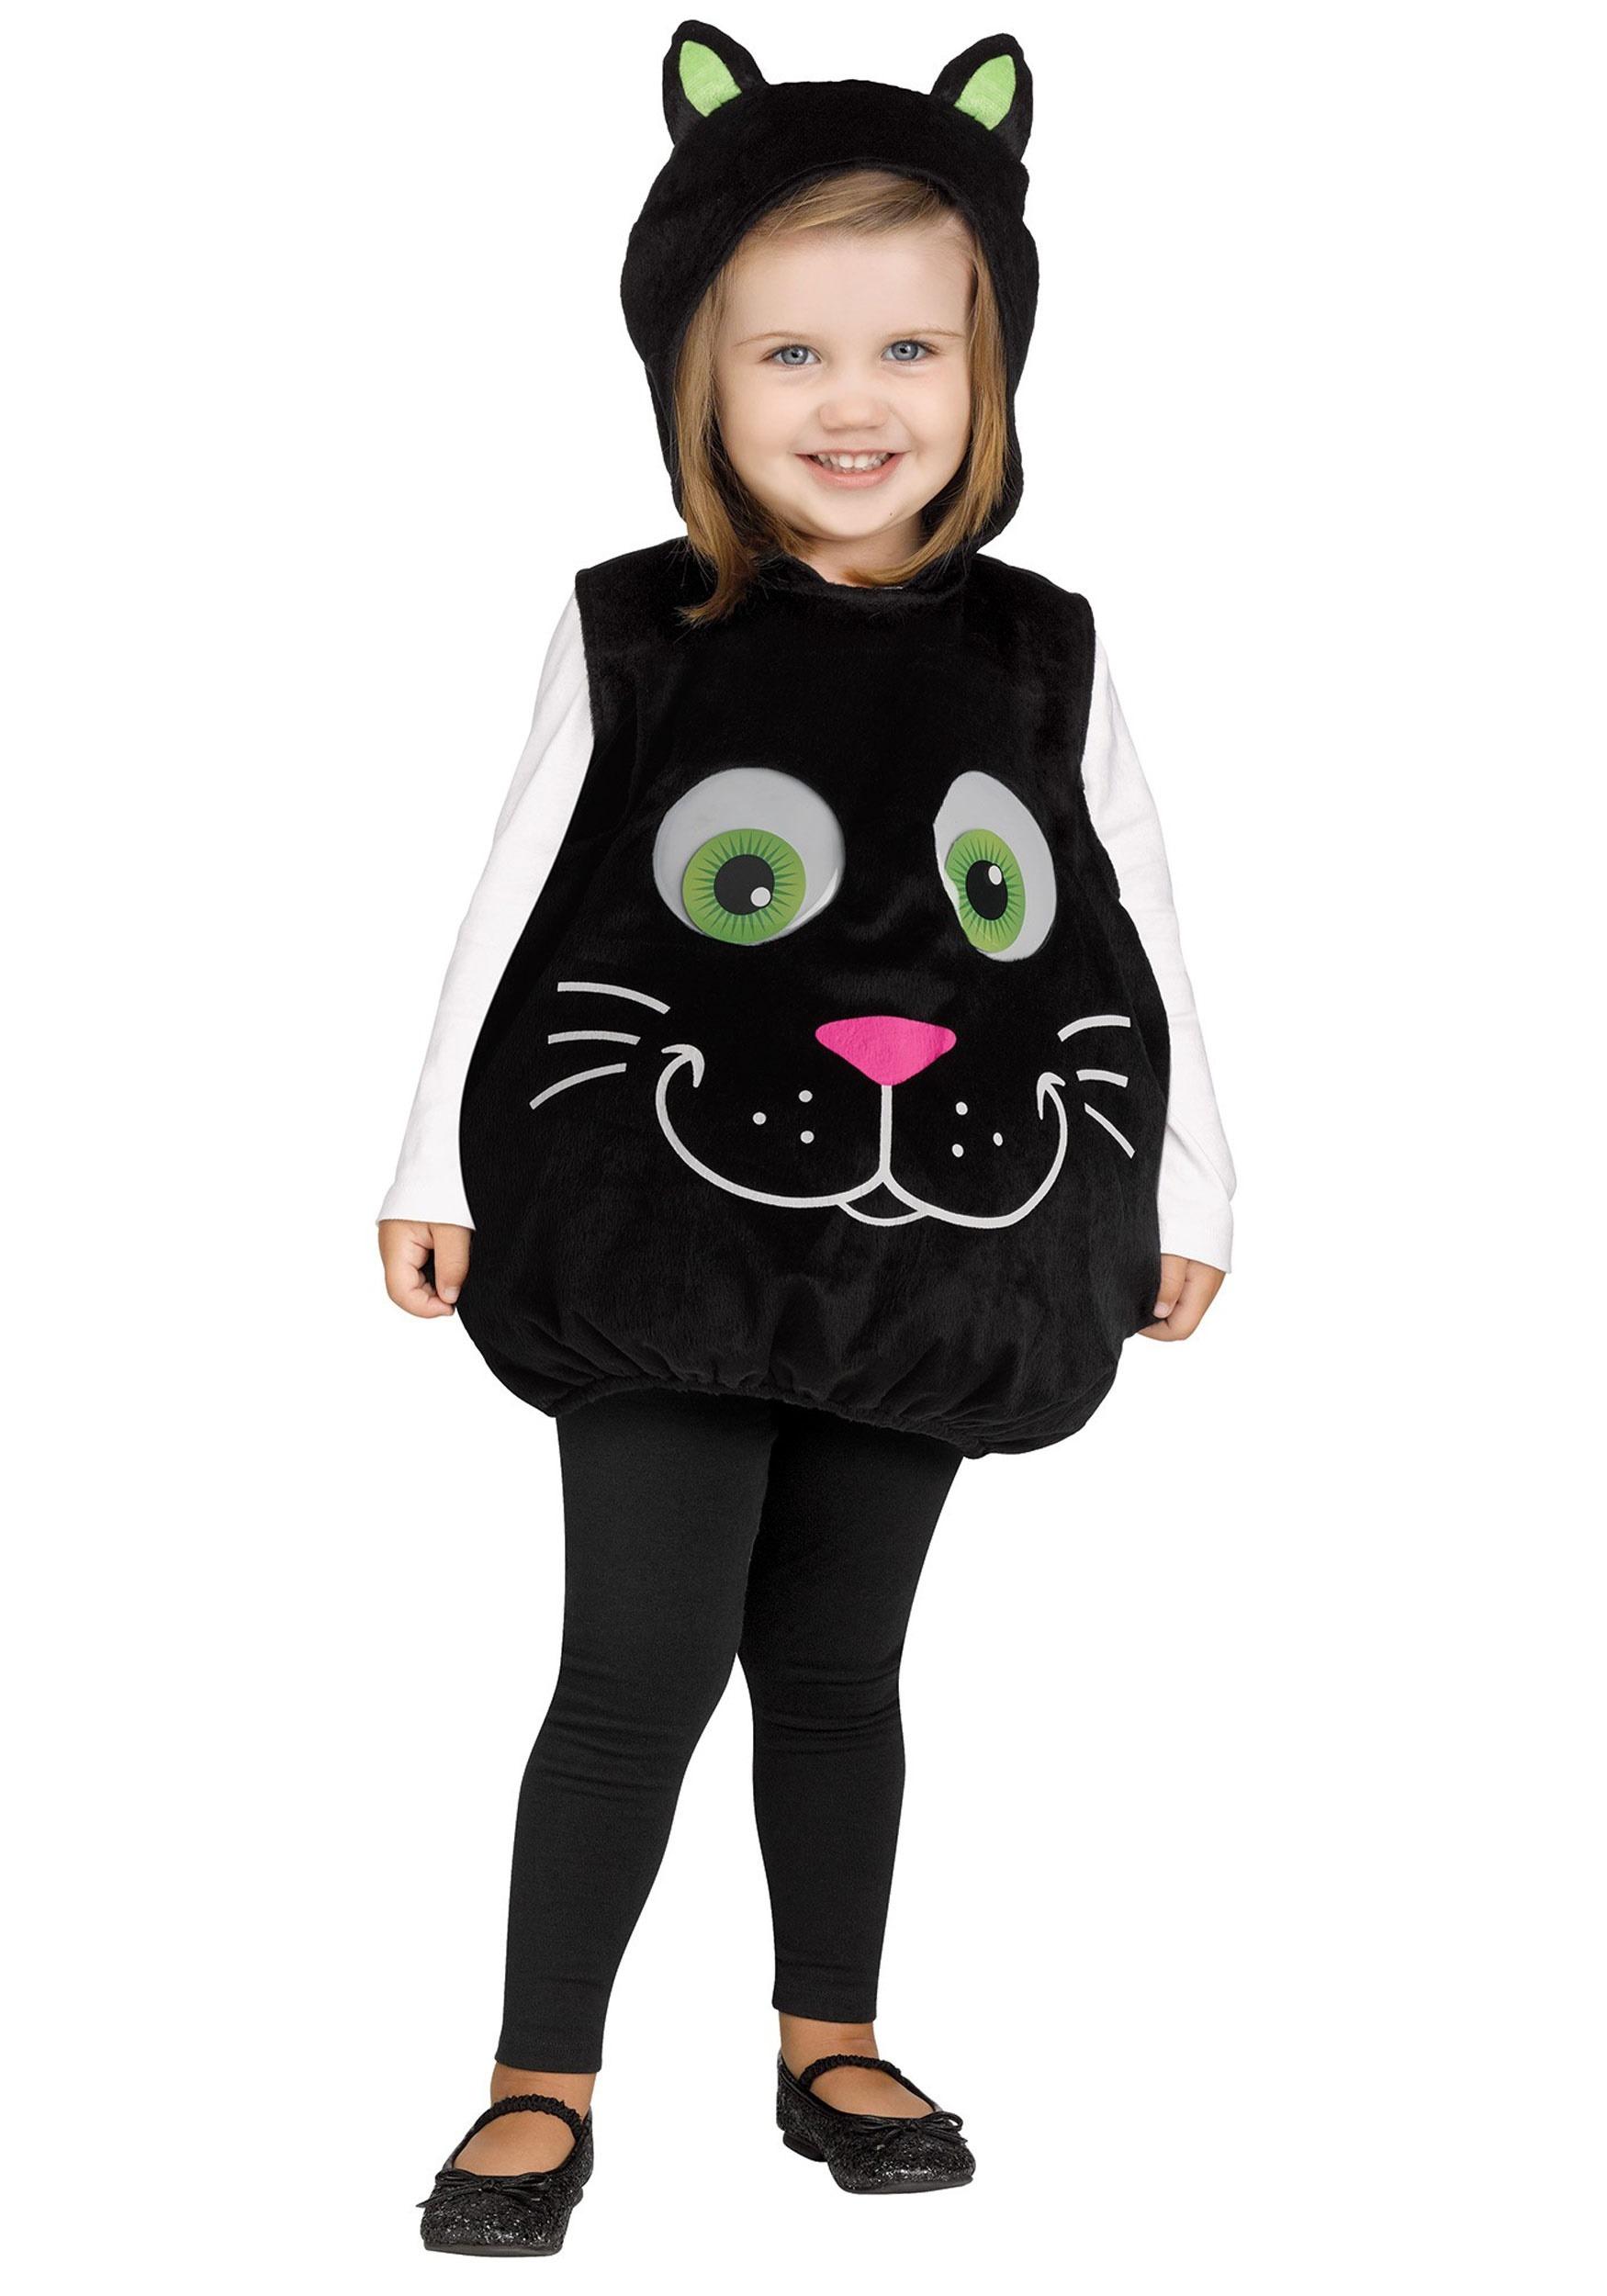 Baby Girl Halloween Costumes 3 6 Months